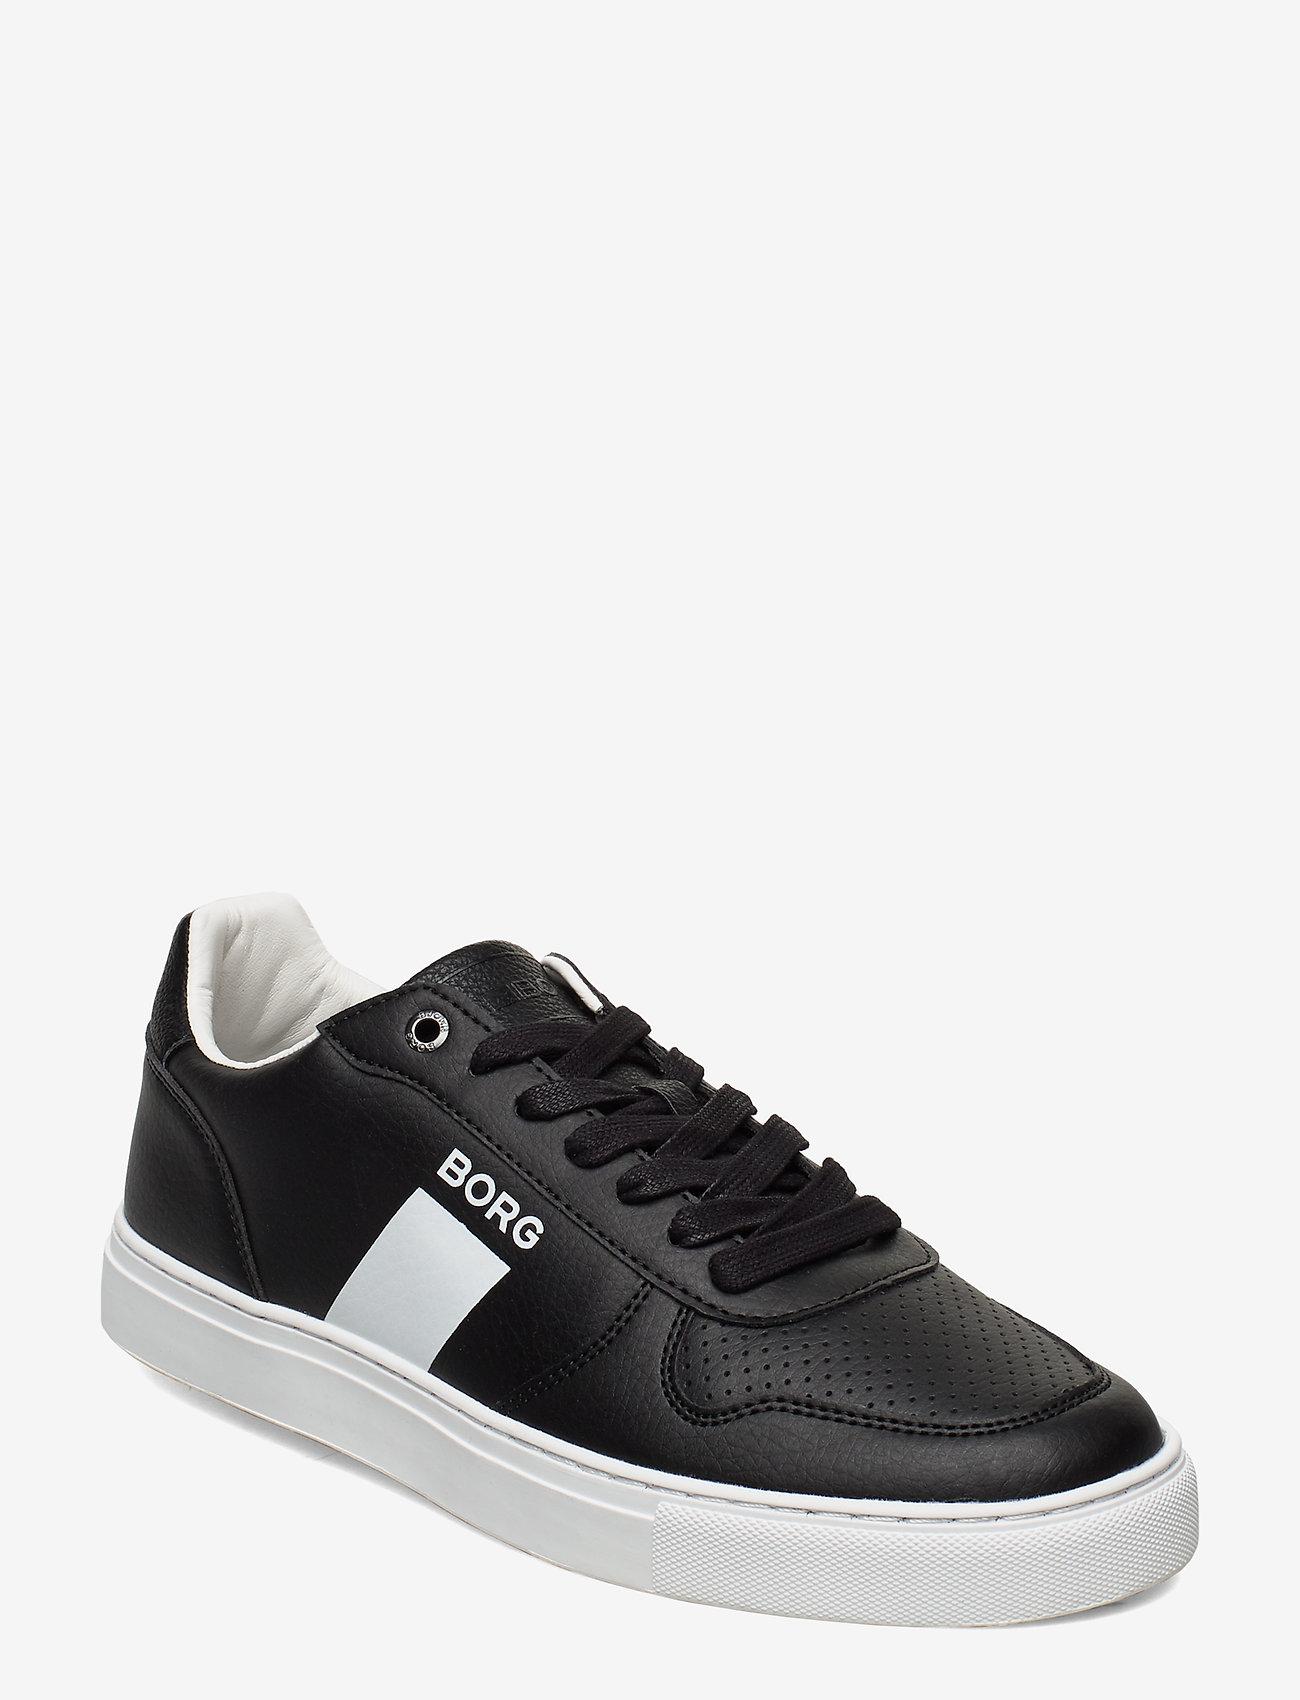 Björn Borg - T220 LOW TMP M - laag sneakers - black-white - 0